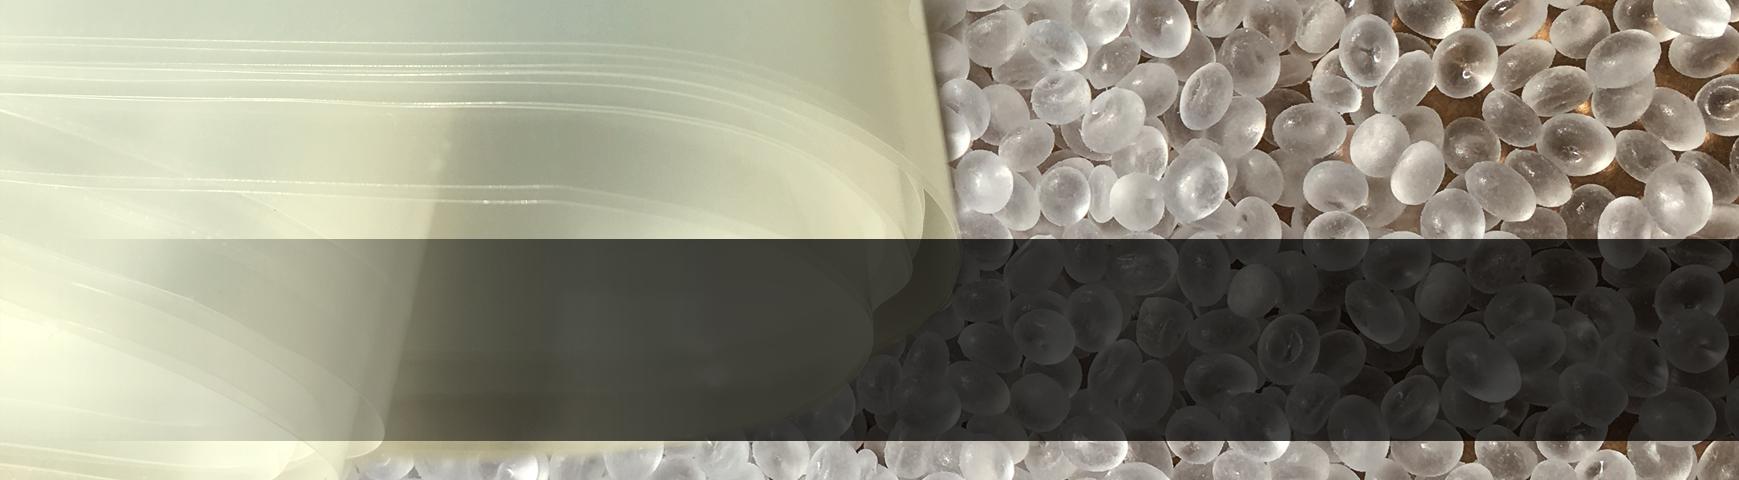 PE抗靜電袋 PE無塵袋 高嘉創造更高質感塑膠製品 - 壓克力板、GPPS板、PE 膜/袋、優良的MIT品質,公道的價格,高嘉為您「點塑成金」。